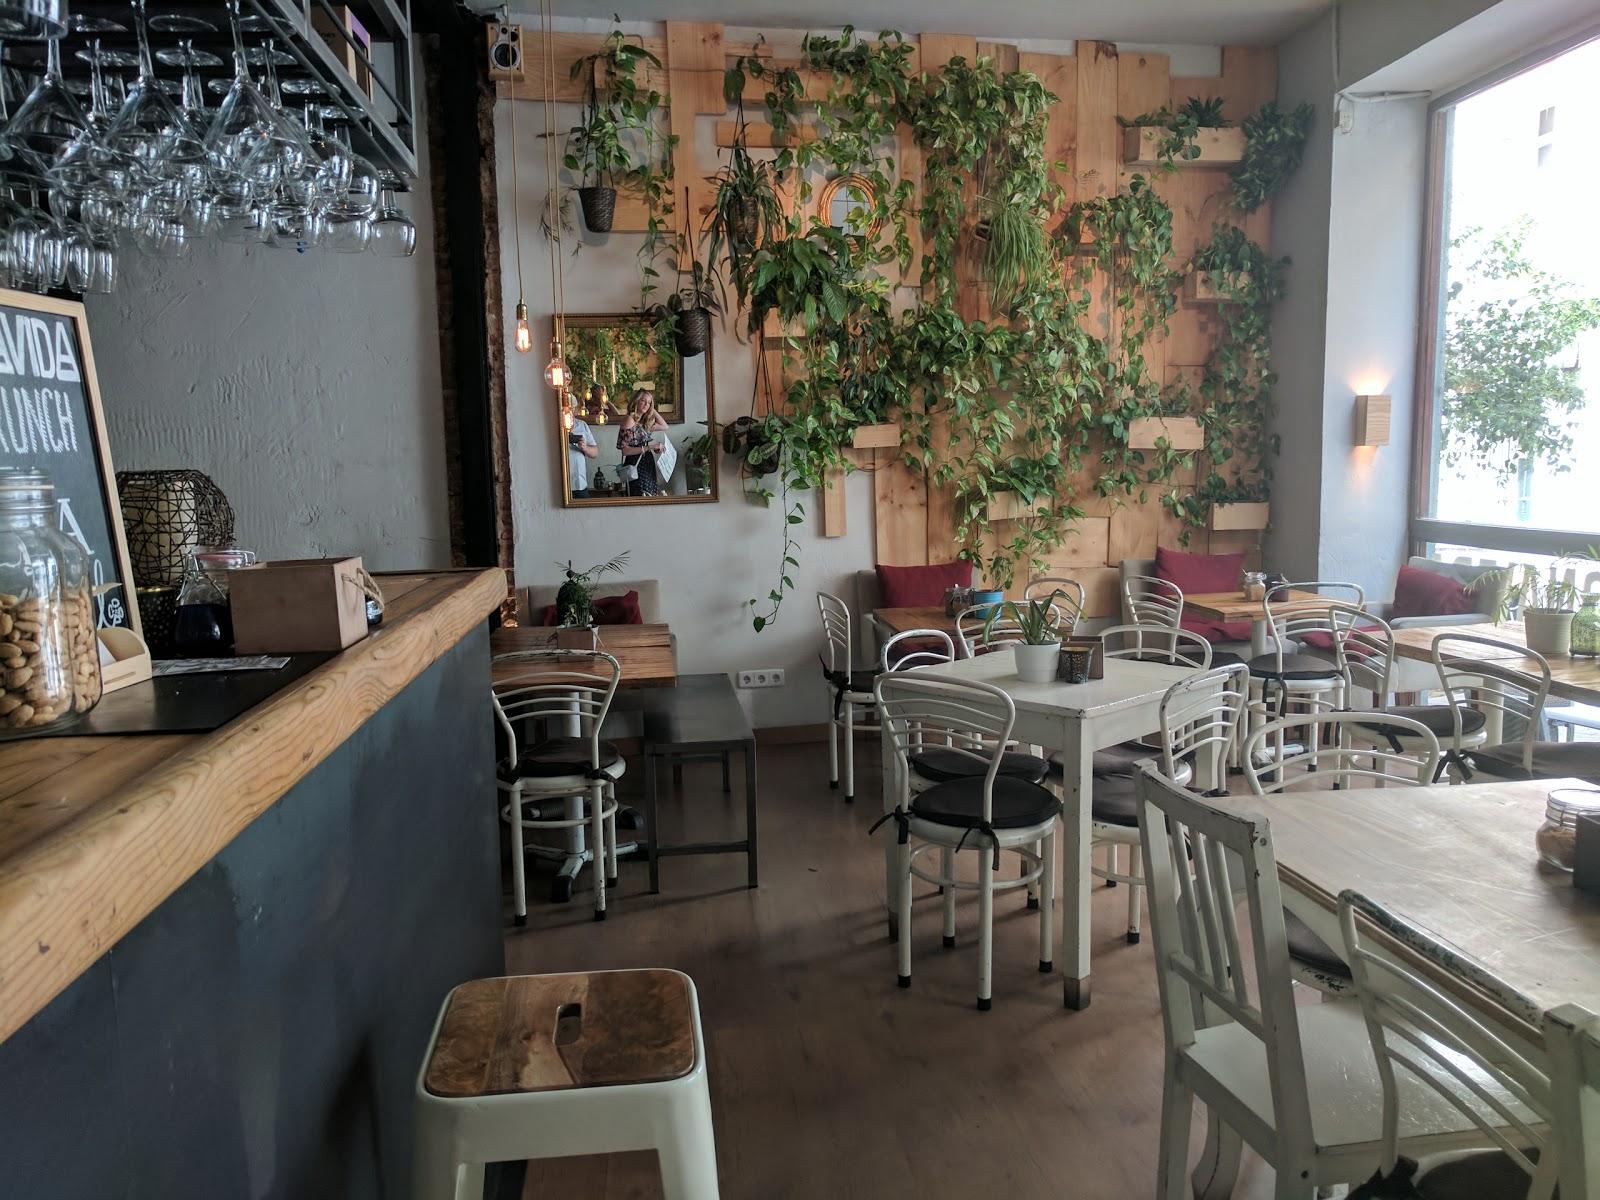 ABONAVIDA: A Work-Friendly Place in Madrid